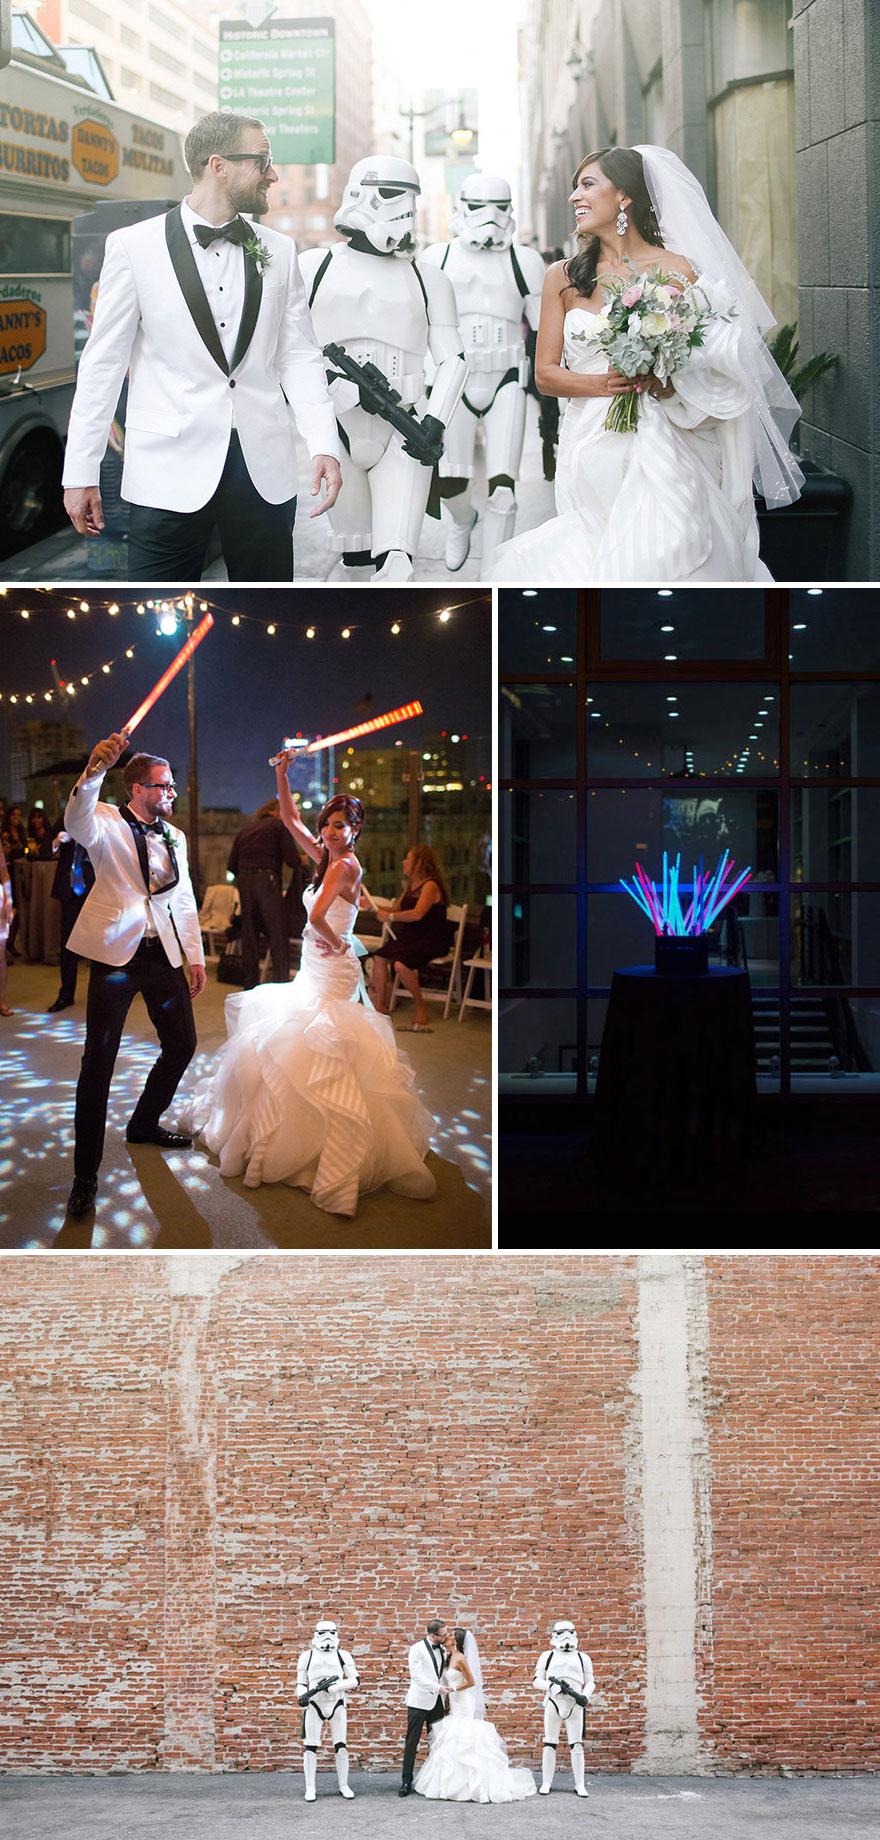 foto-matrimonio-tematico-immagini-10